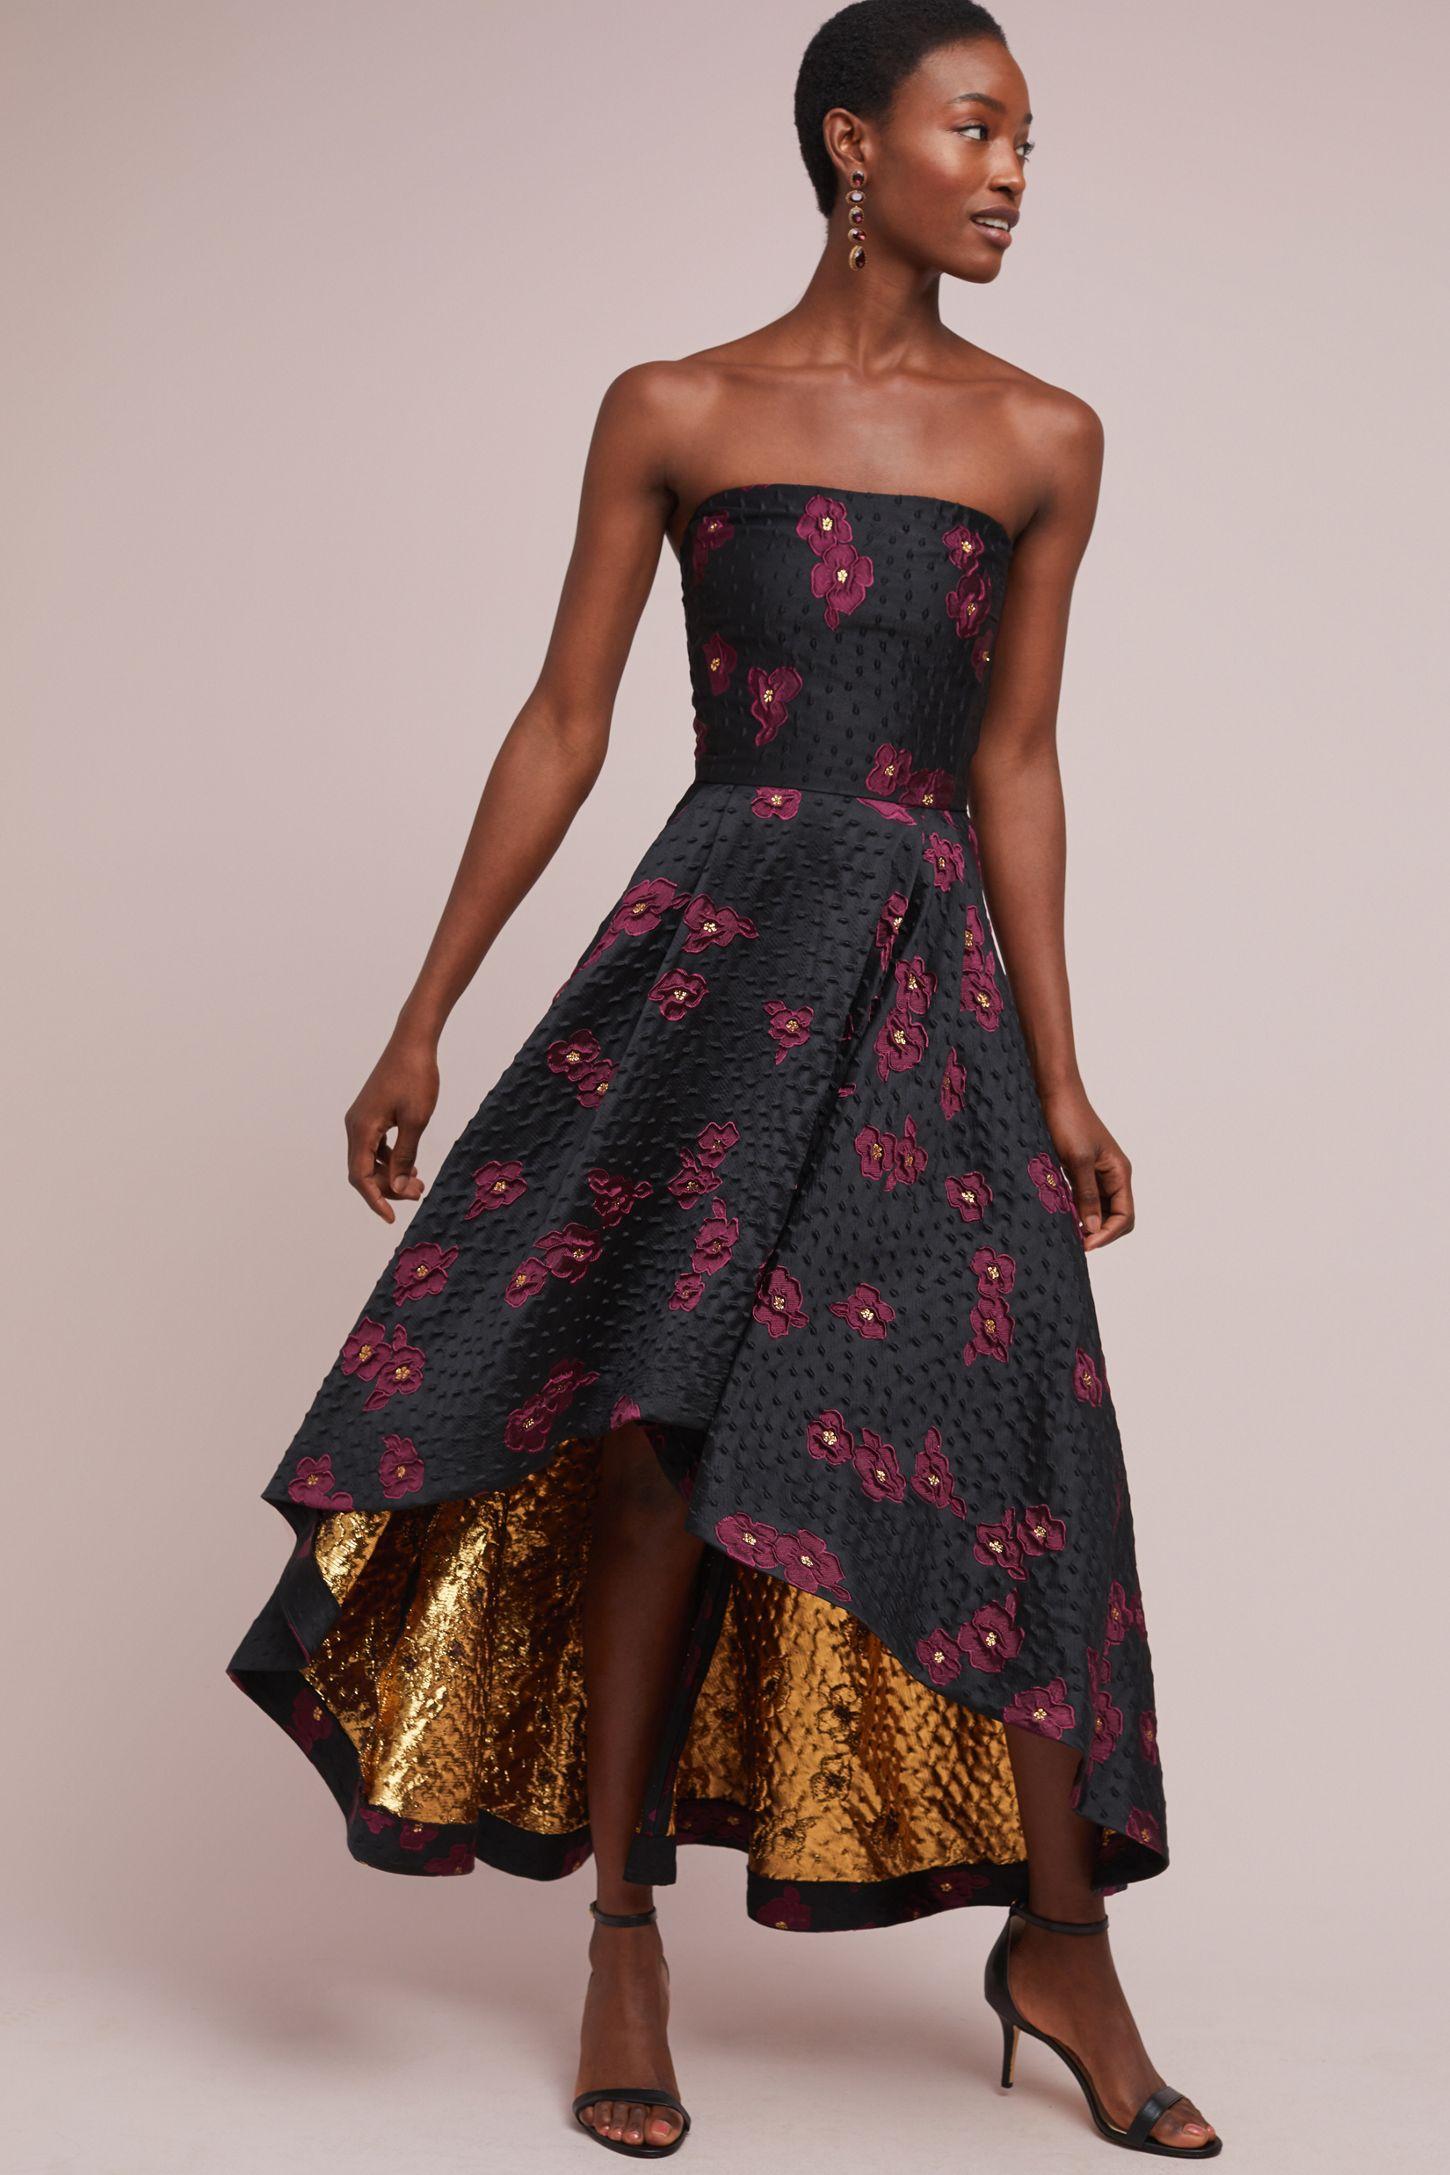 6a65fafe905 Shoshanna Paladino Metallic Ball Gown